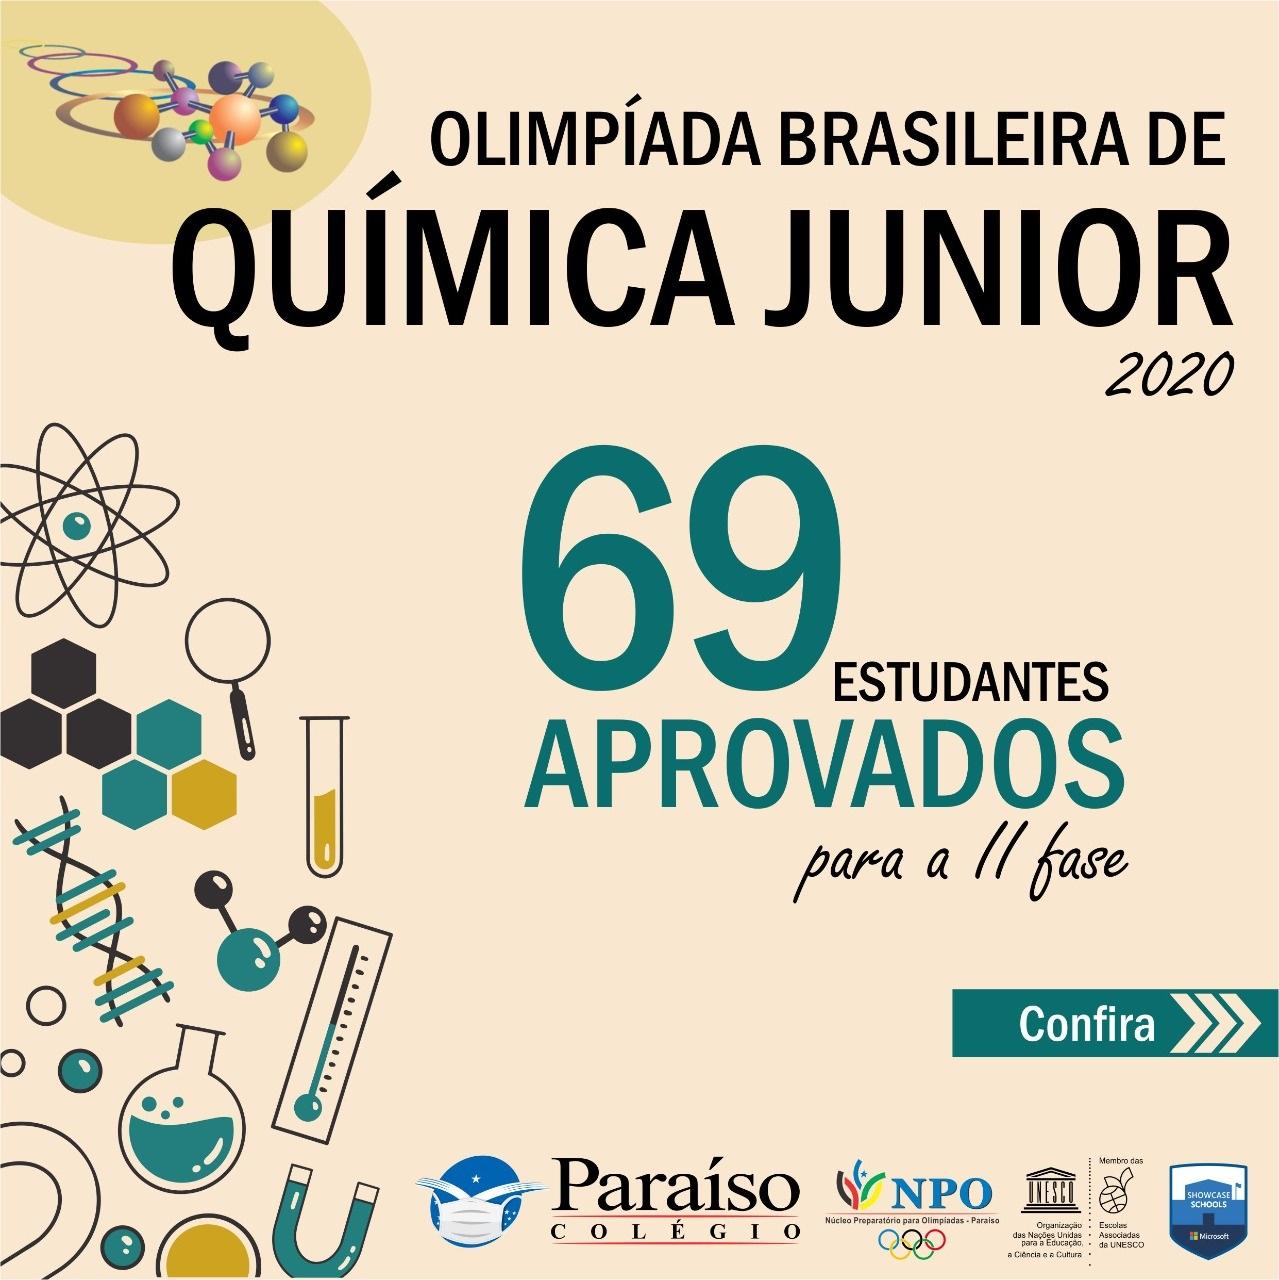 Lista de aprovados para II fase da Olimpíada Brasileira de Química Júnior 2020